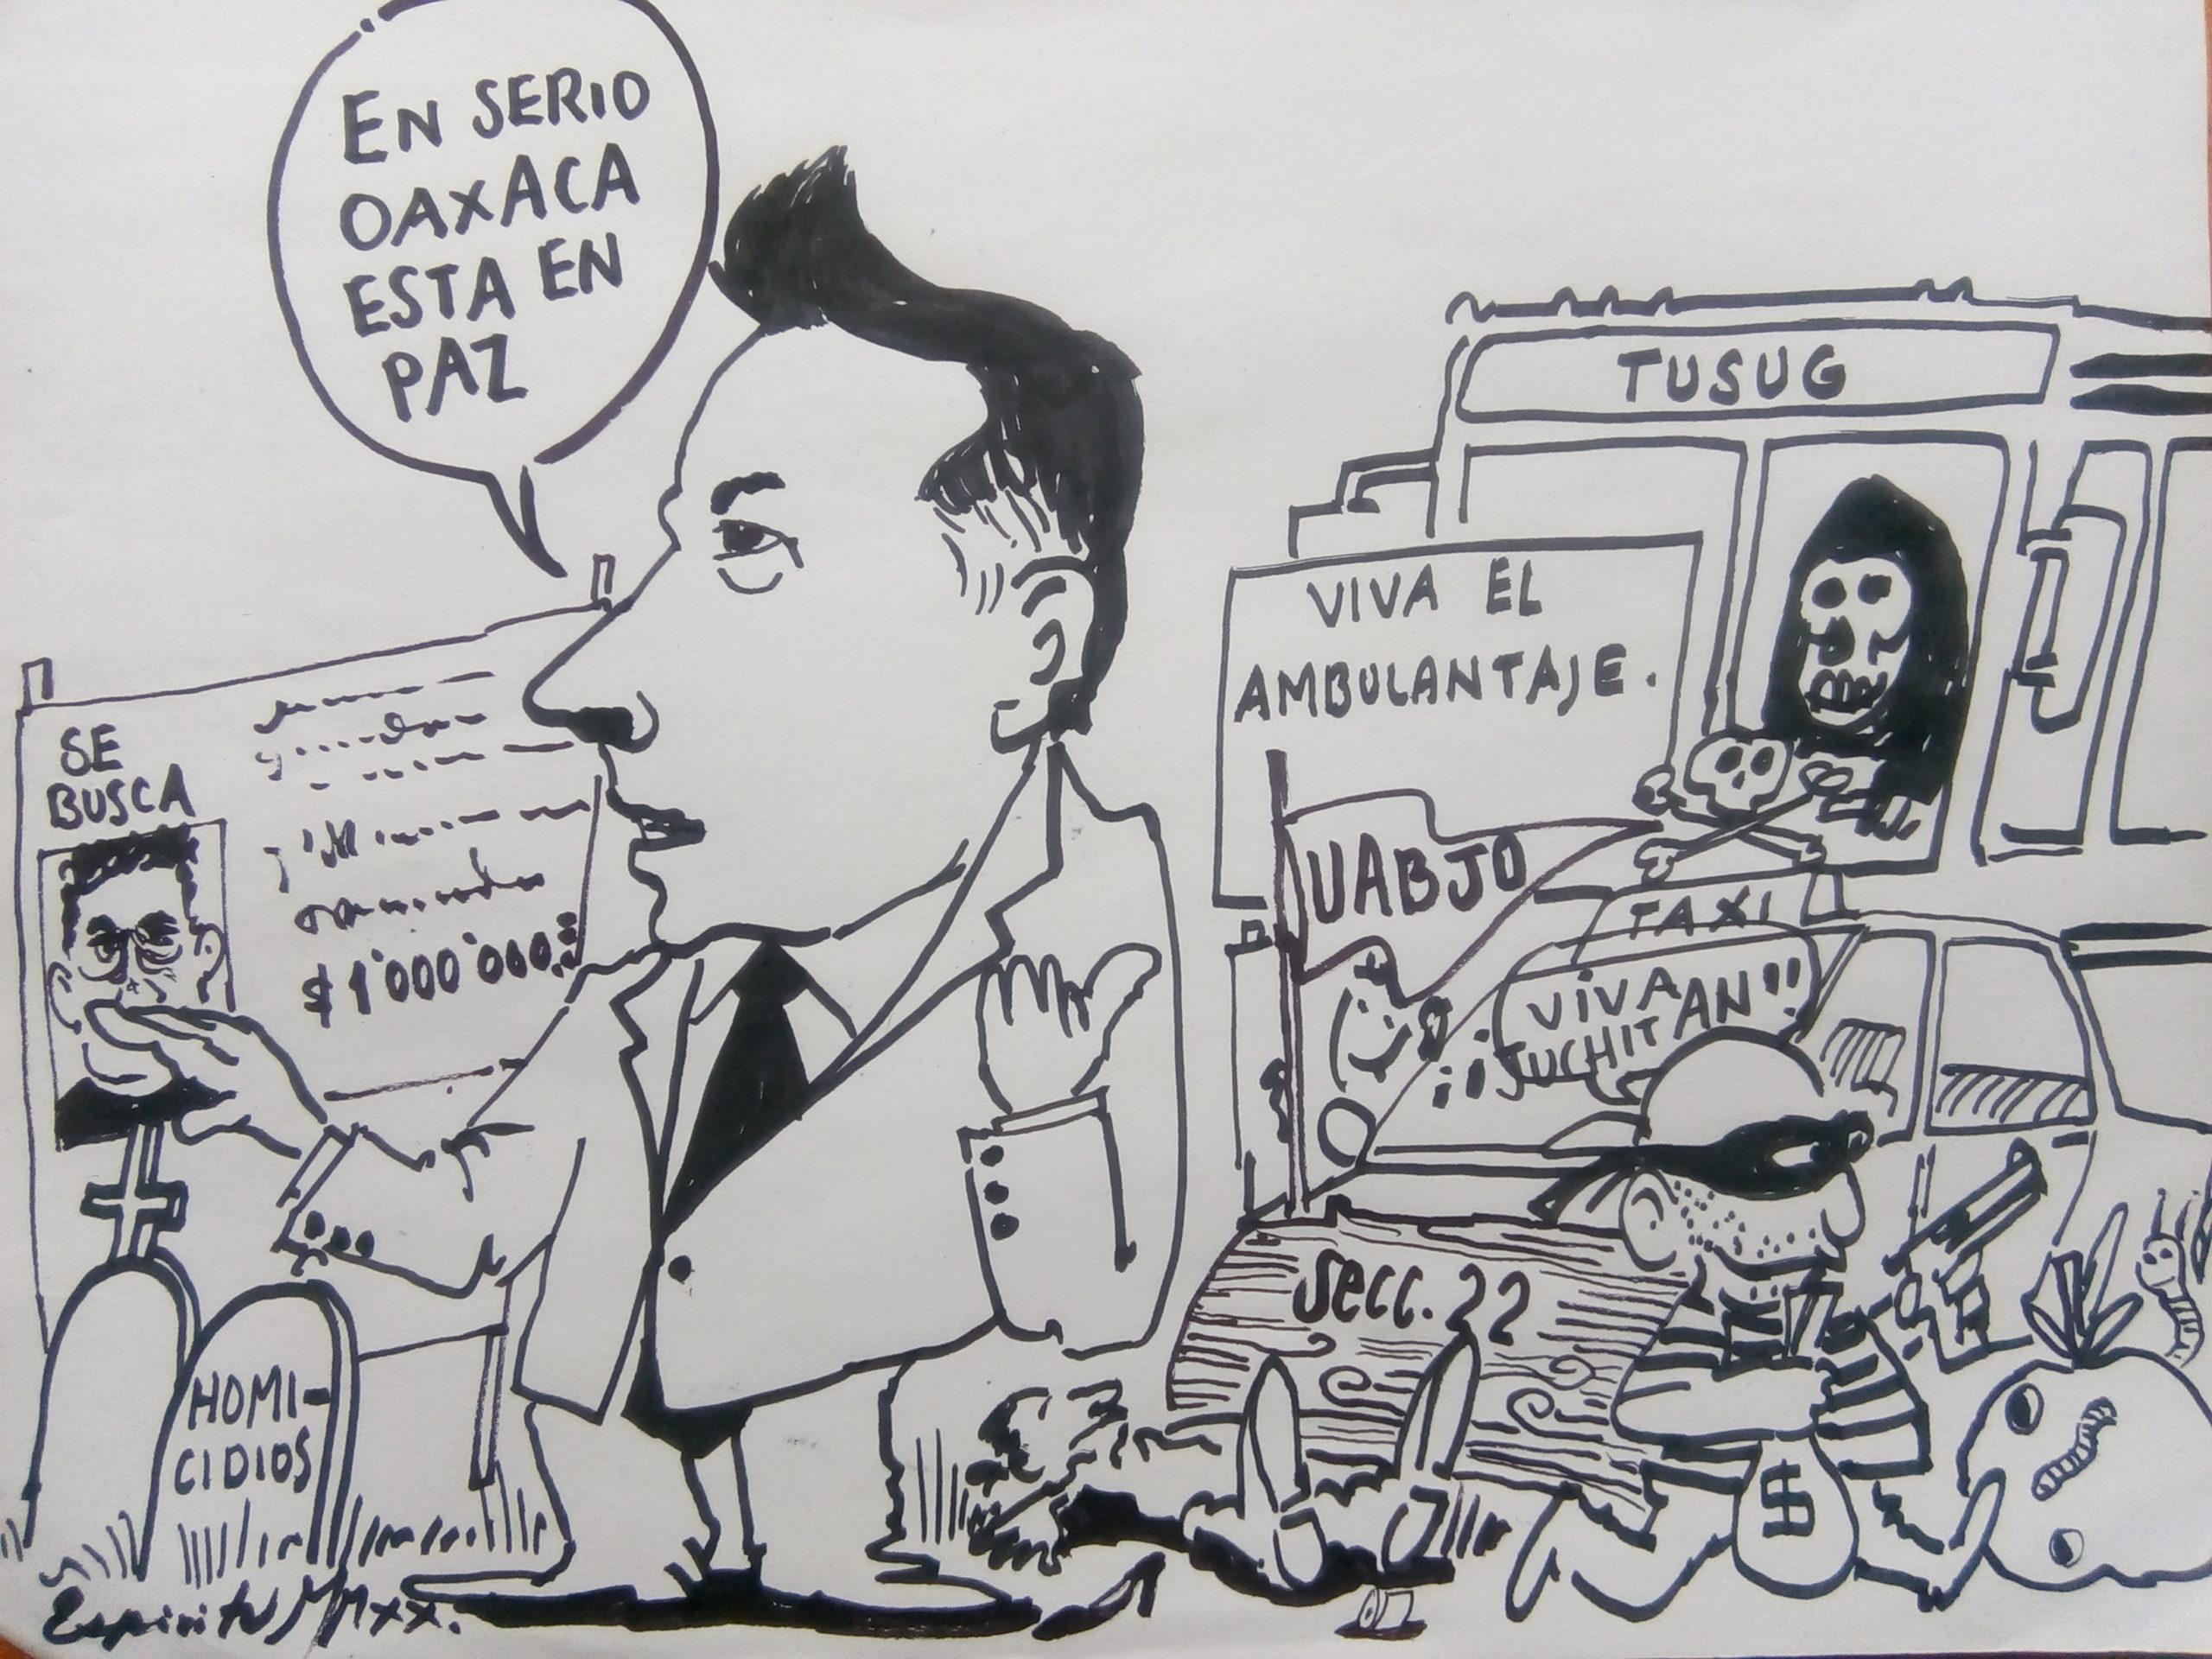 Espíritu 27 de febrero | El Imparcial de Oaxaca